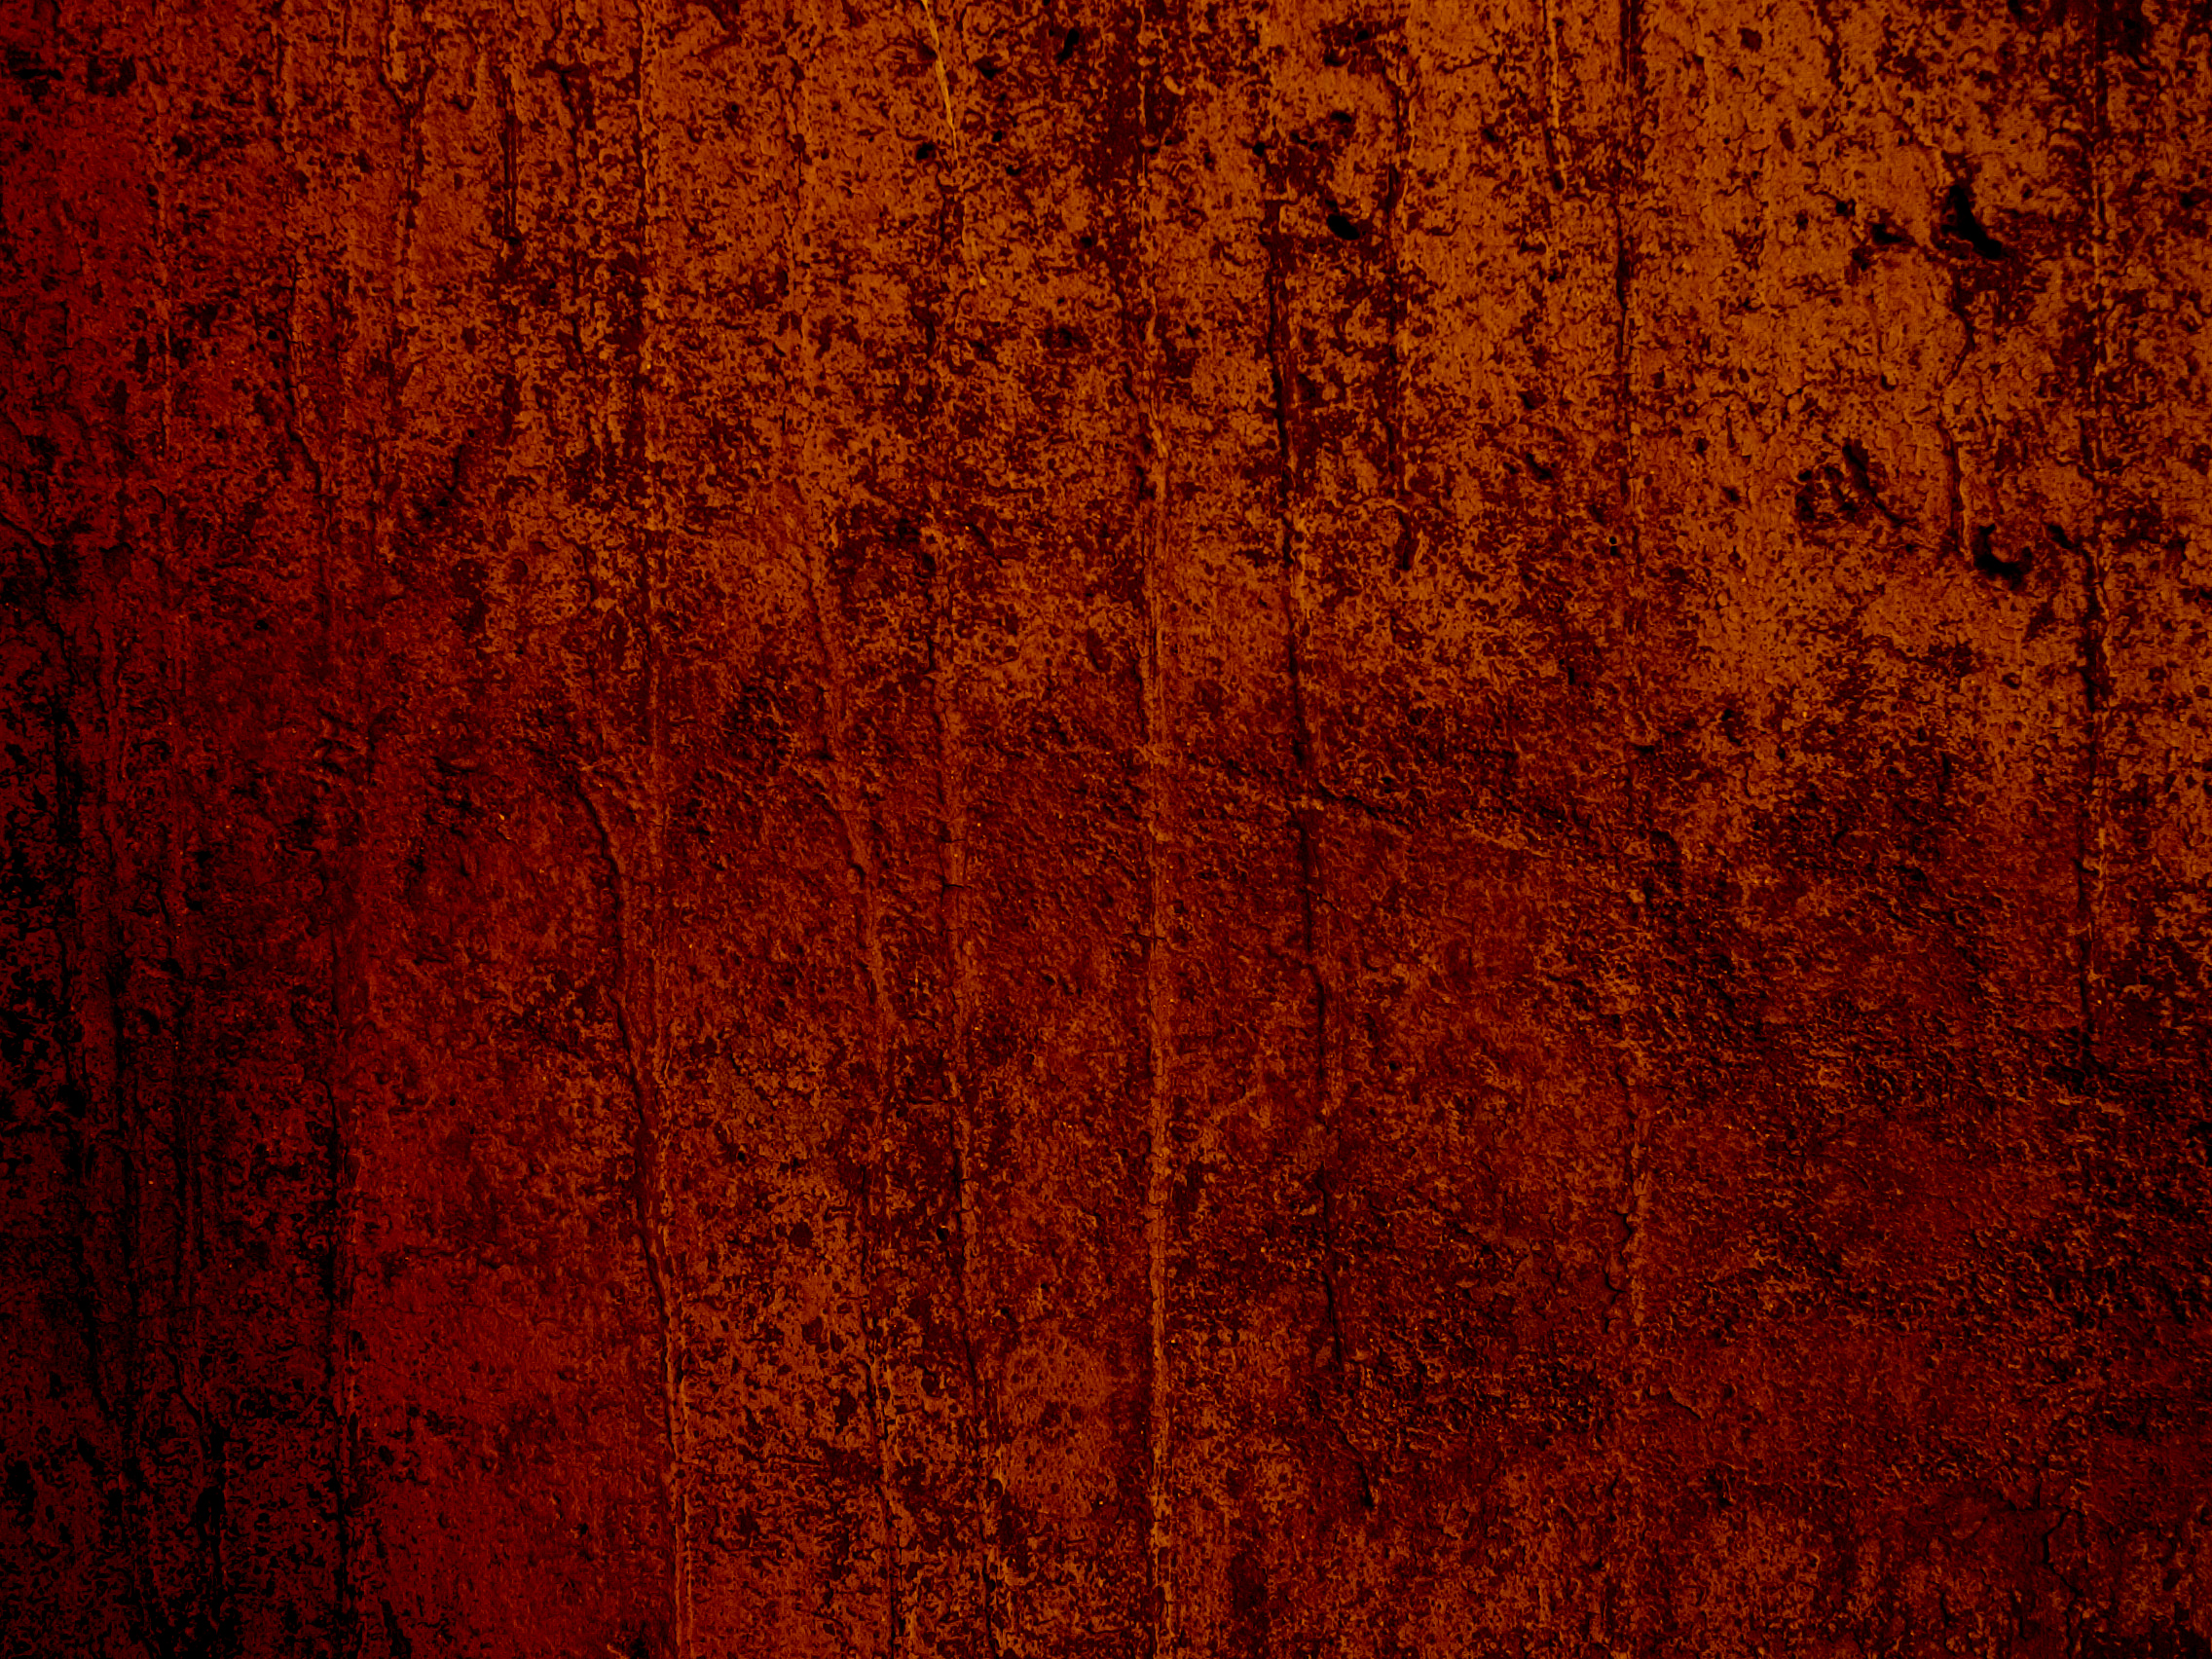 Texture Background Wallpaper